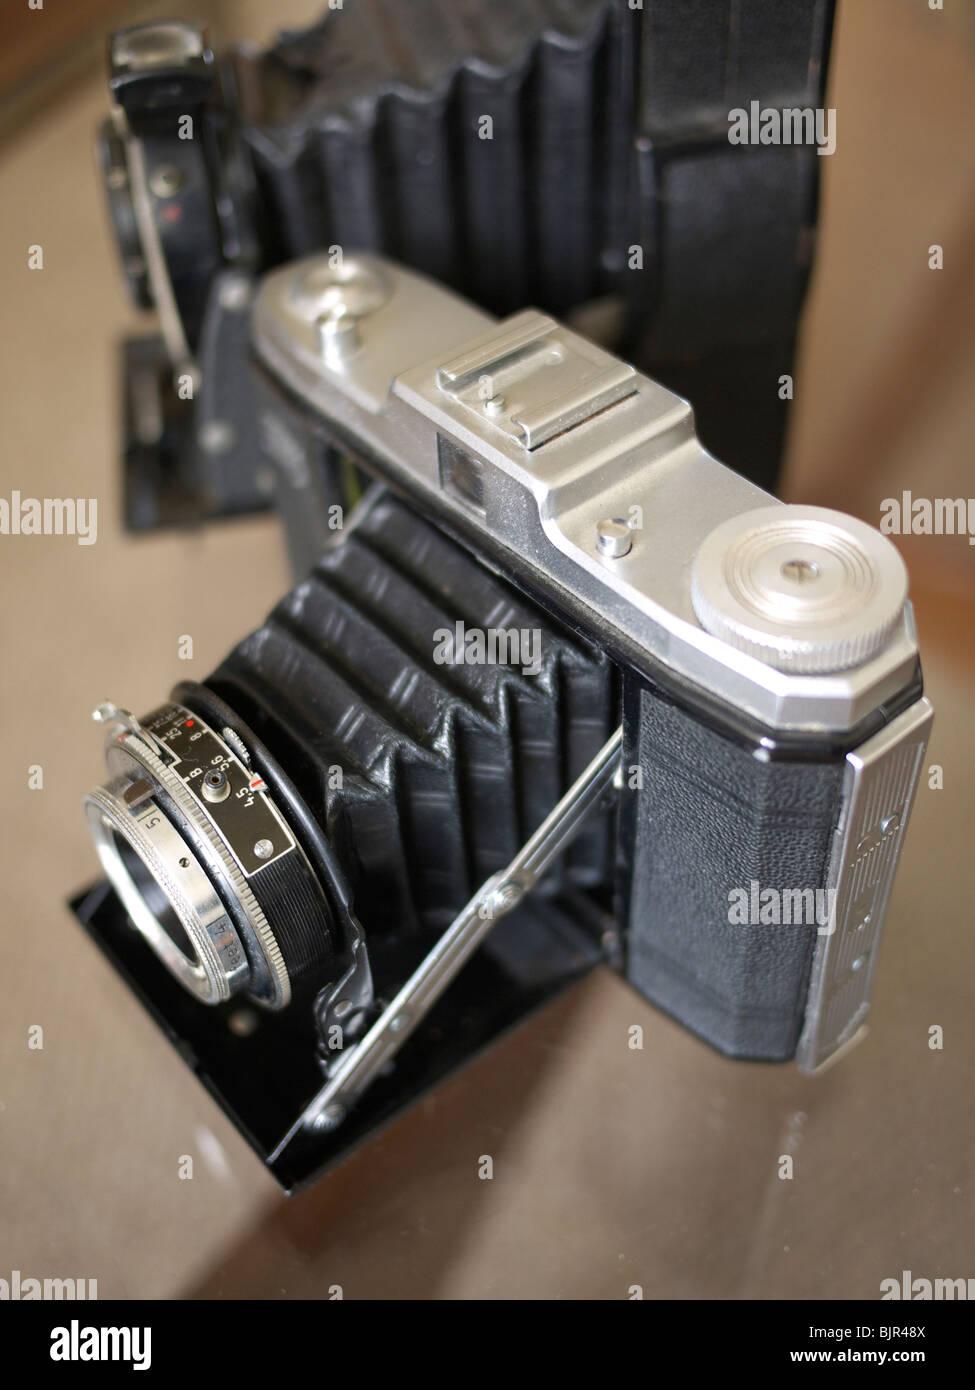 Vintage folding camera. - Stock Image